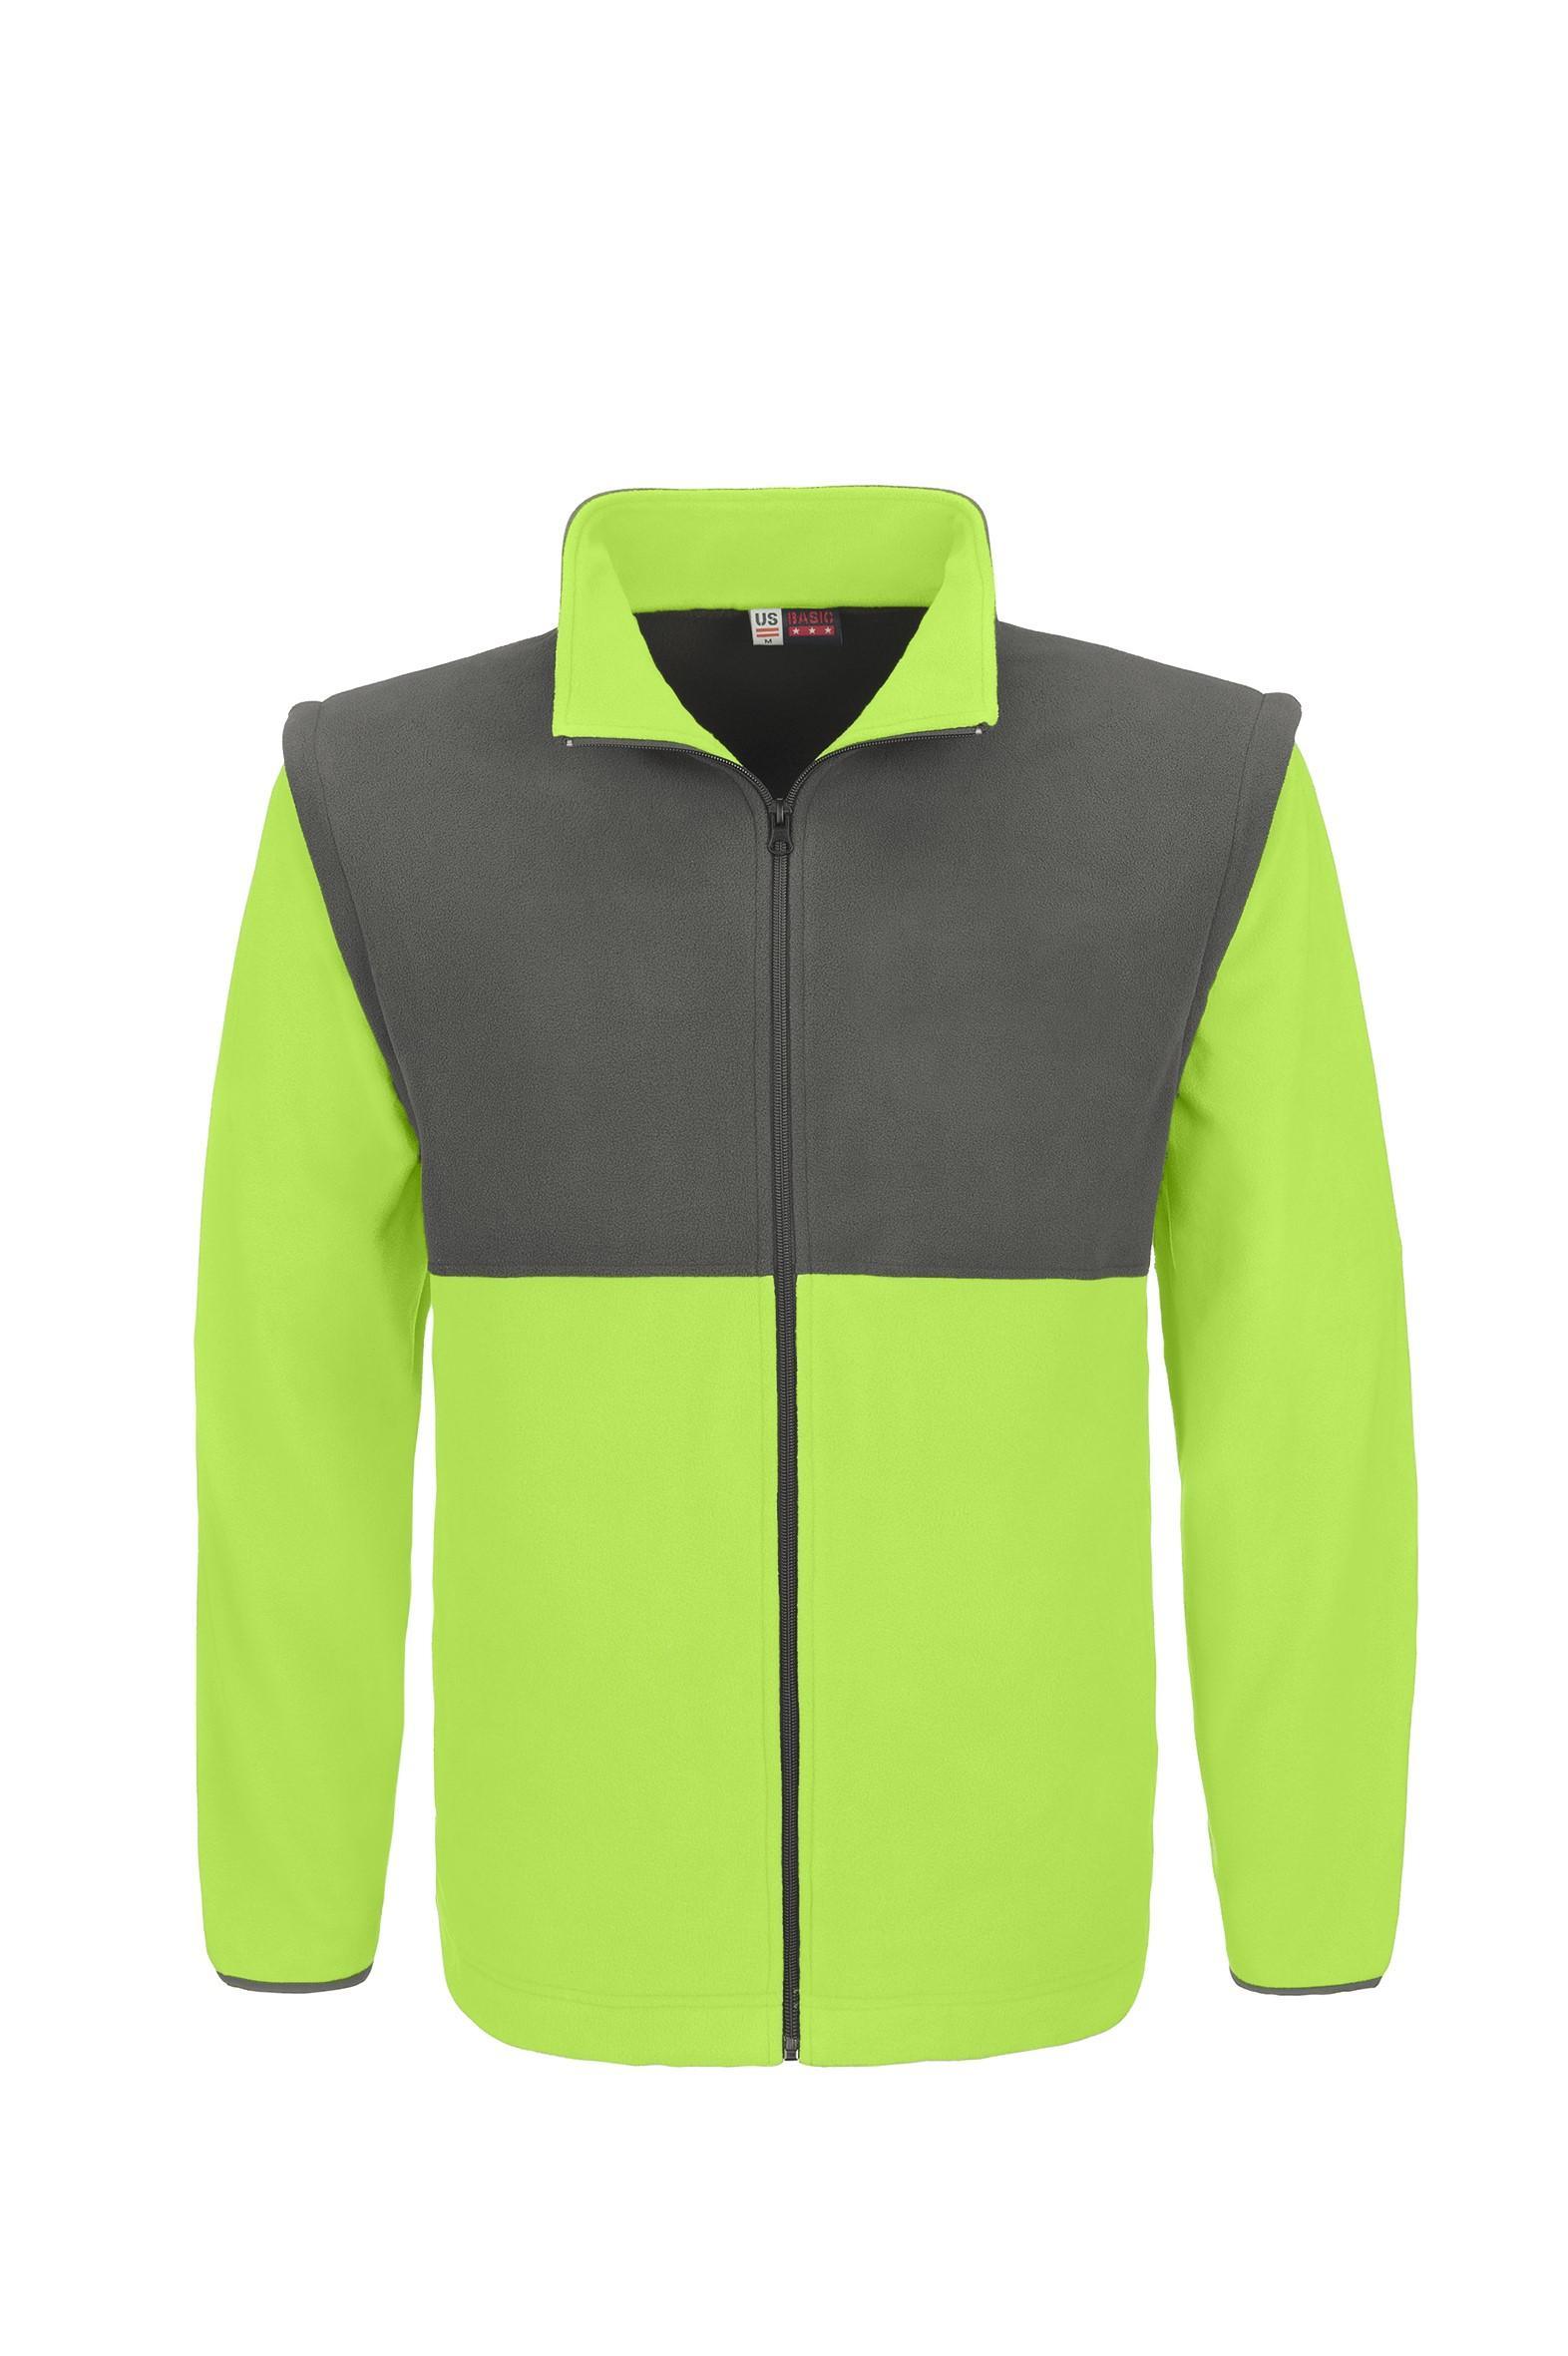 Mens Benneton Zip-off Micro Fleece Jacket - Lime Only